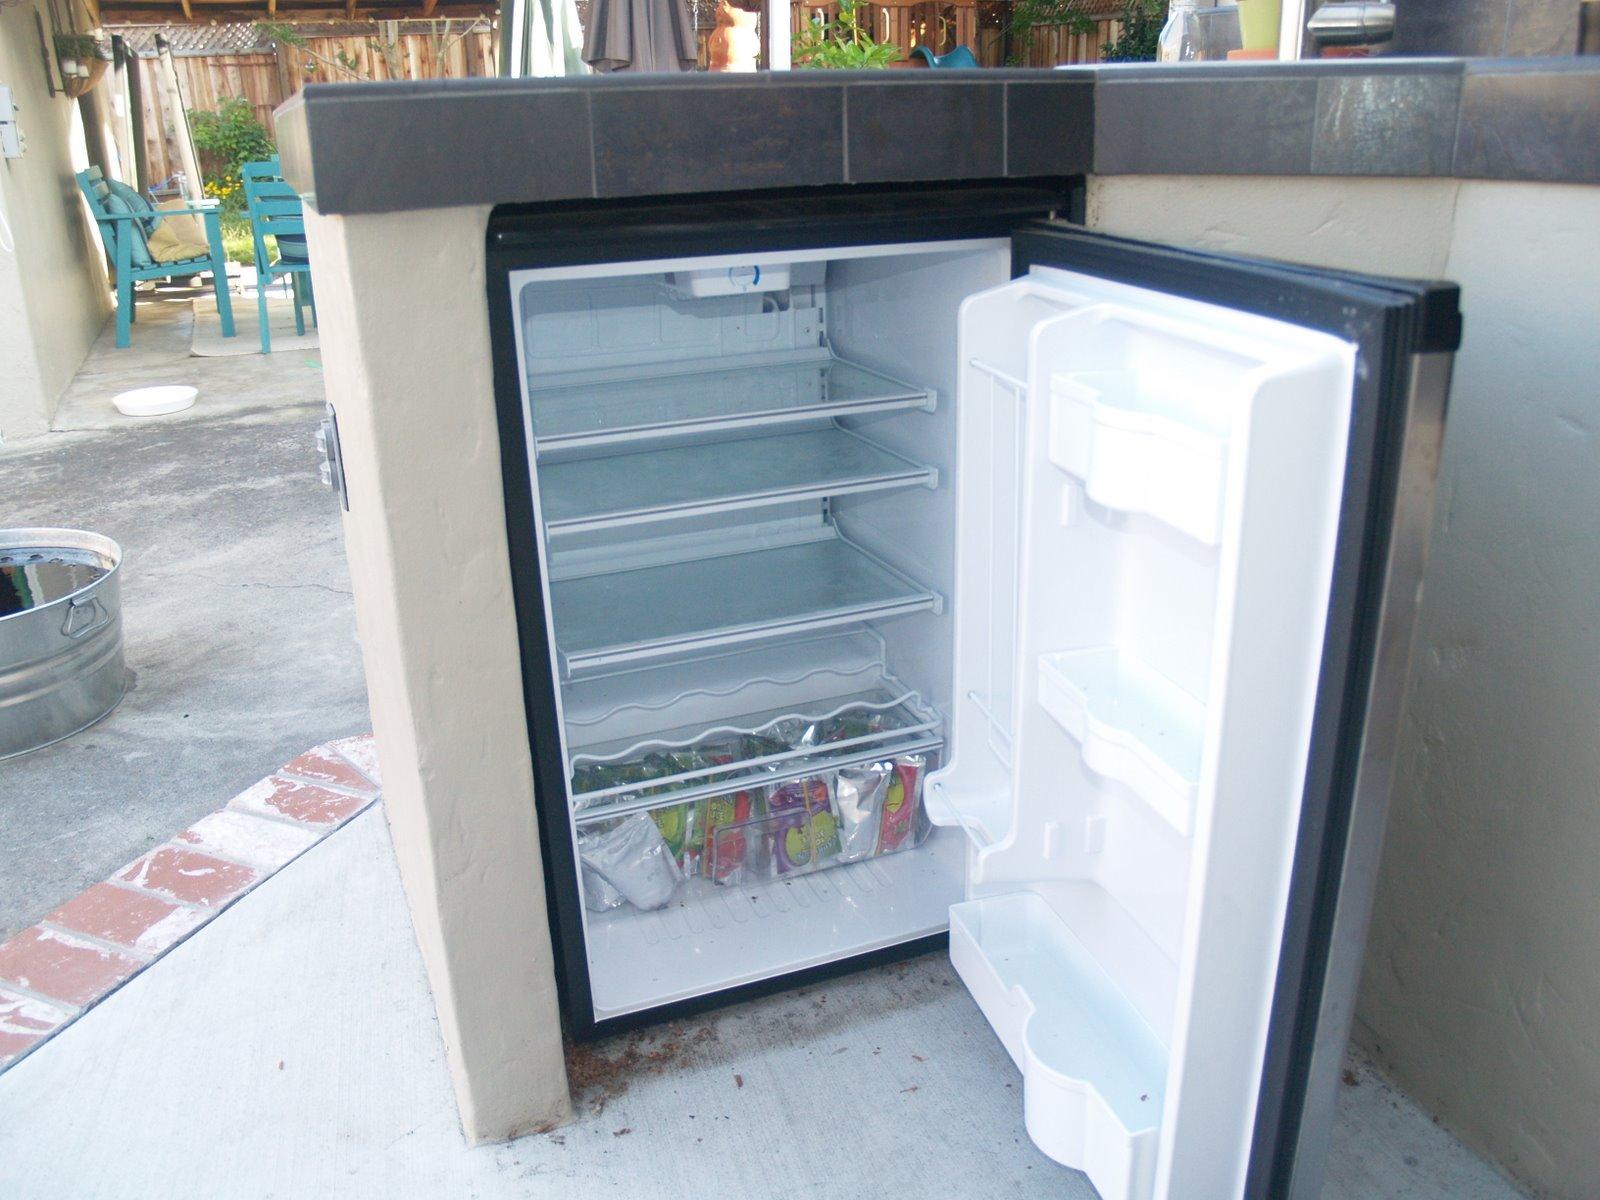 Guess What?: Kegerator conversion of Danby mini-fridge